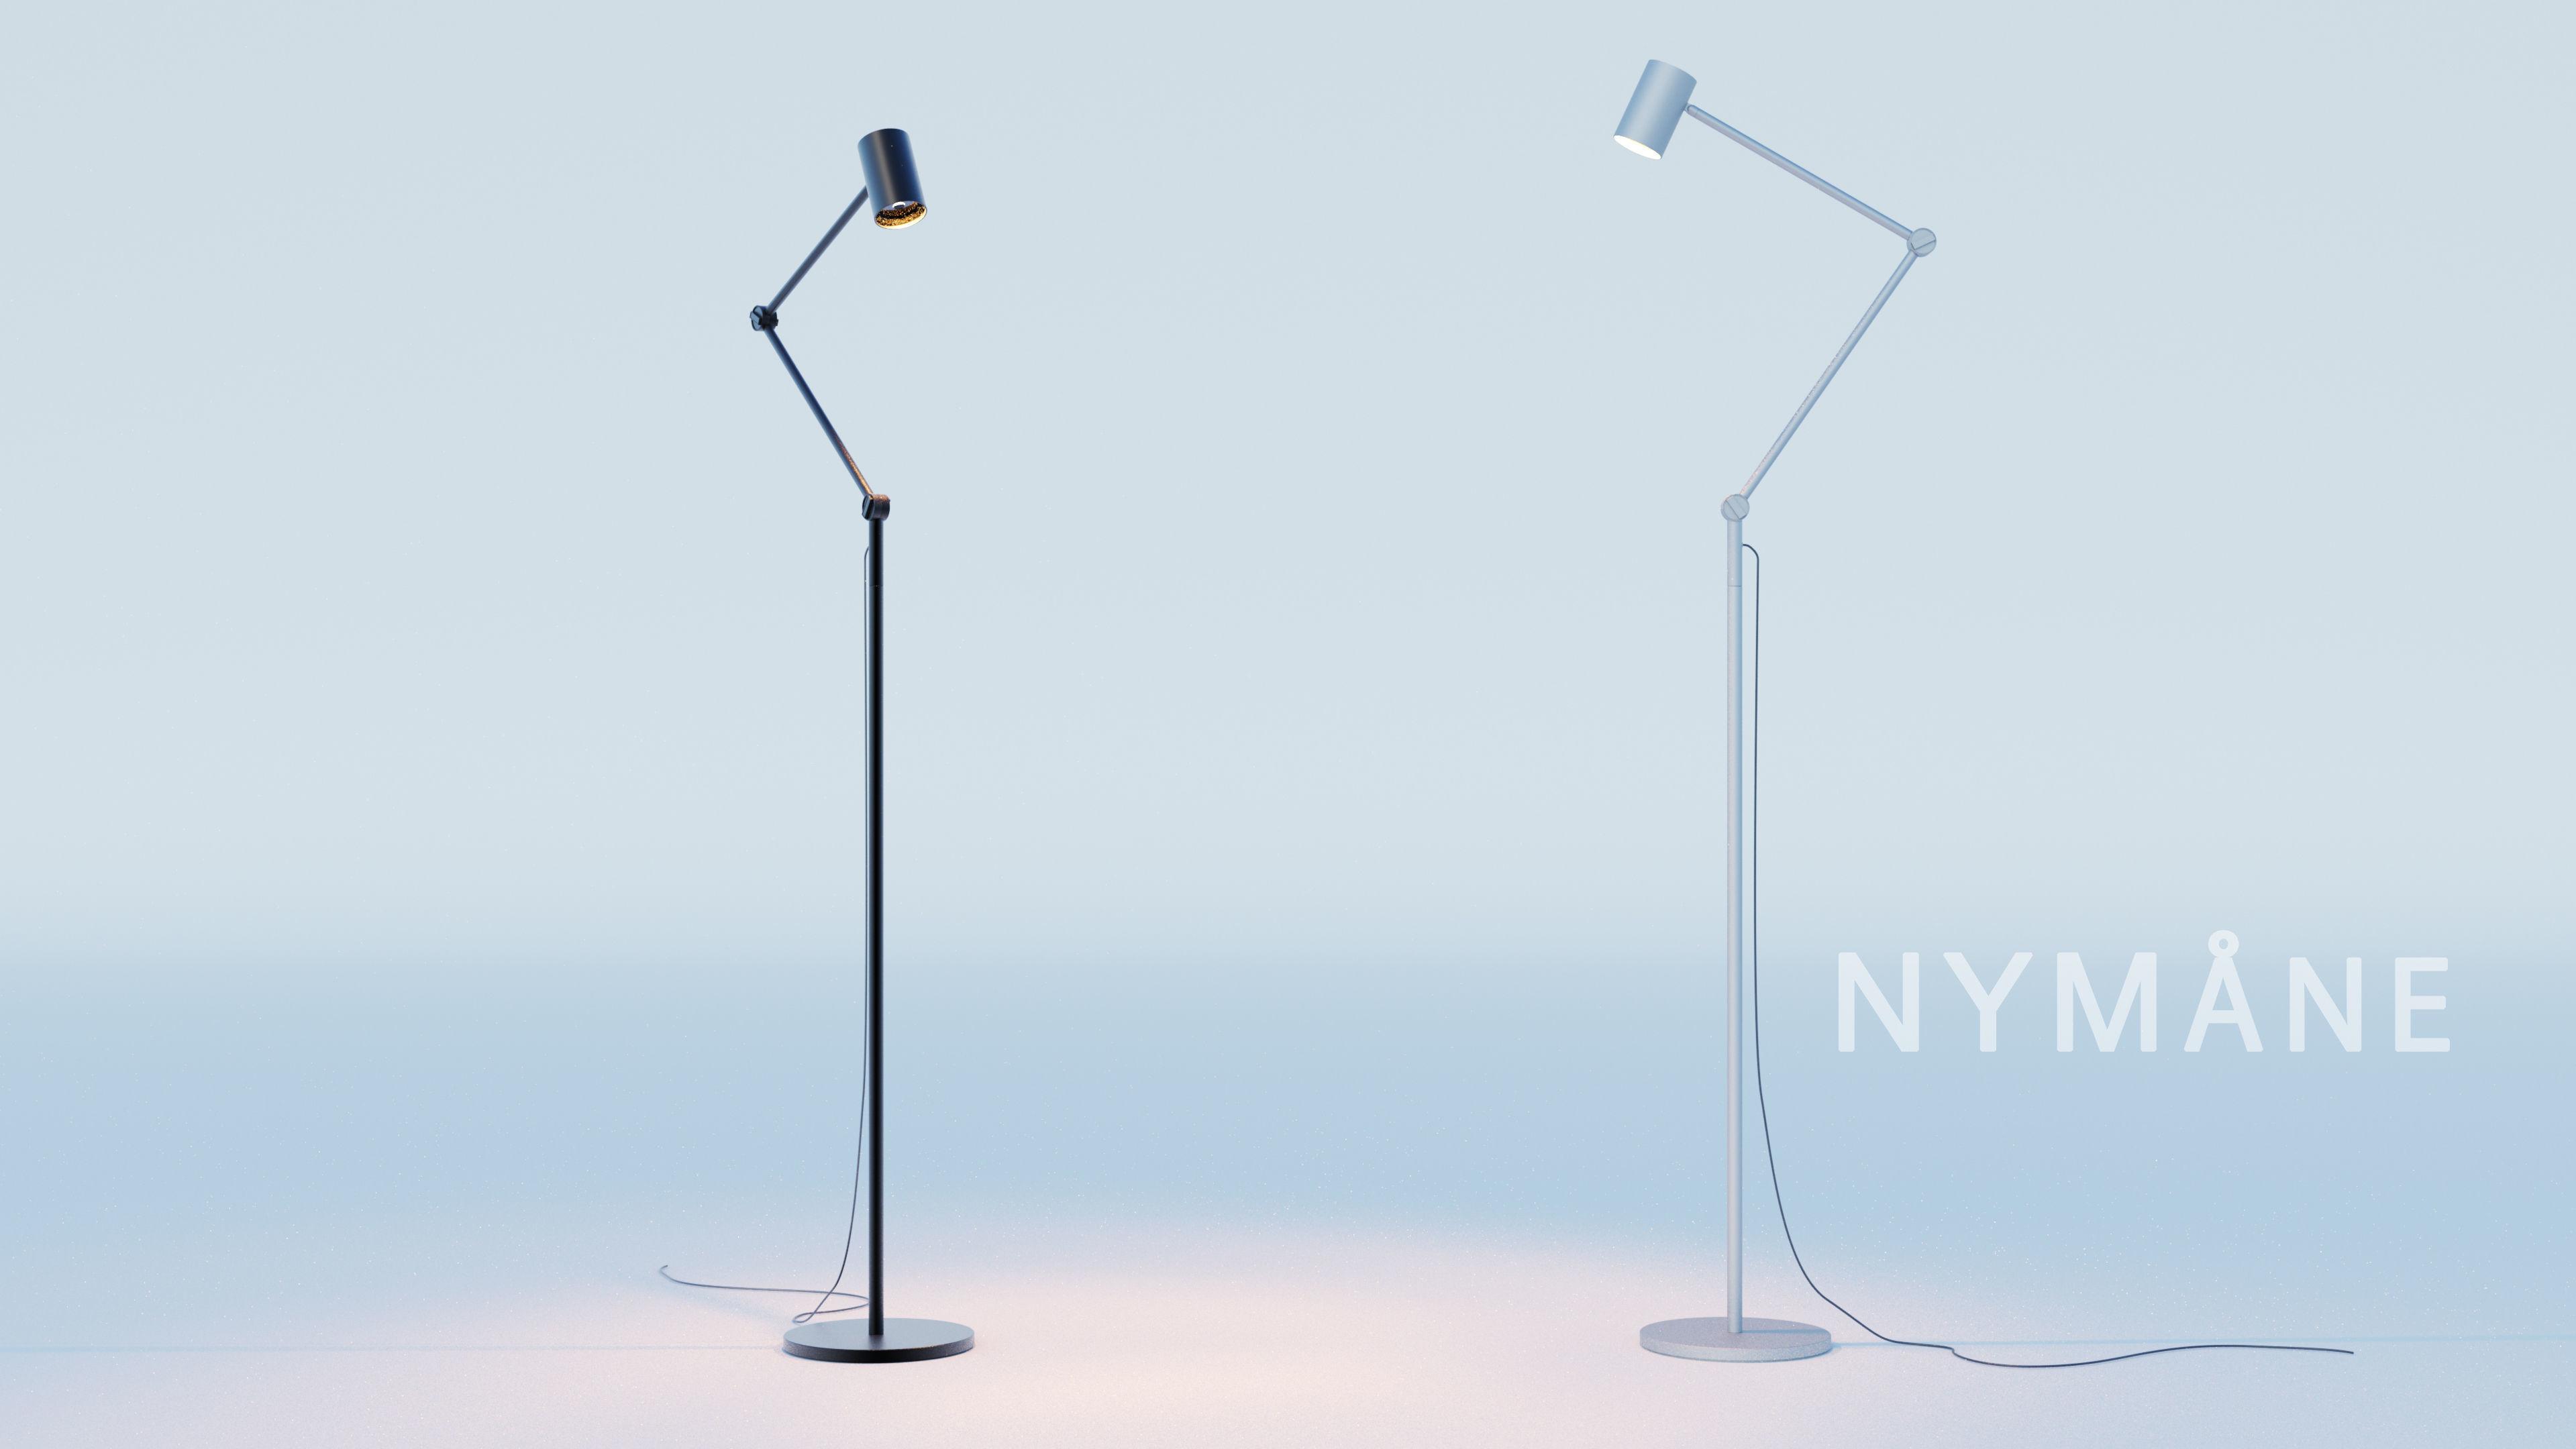 Nymane Ikea 2019 Floor Lamp Model